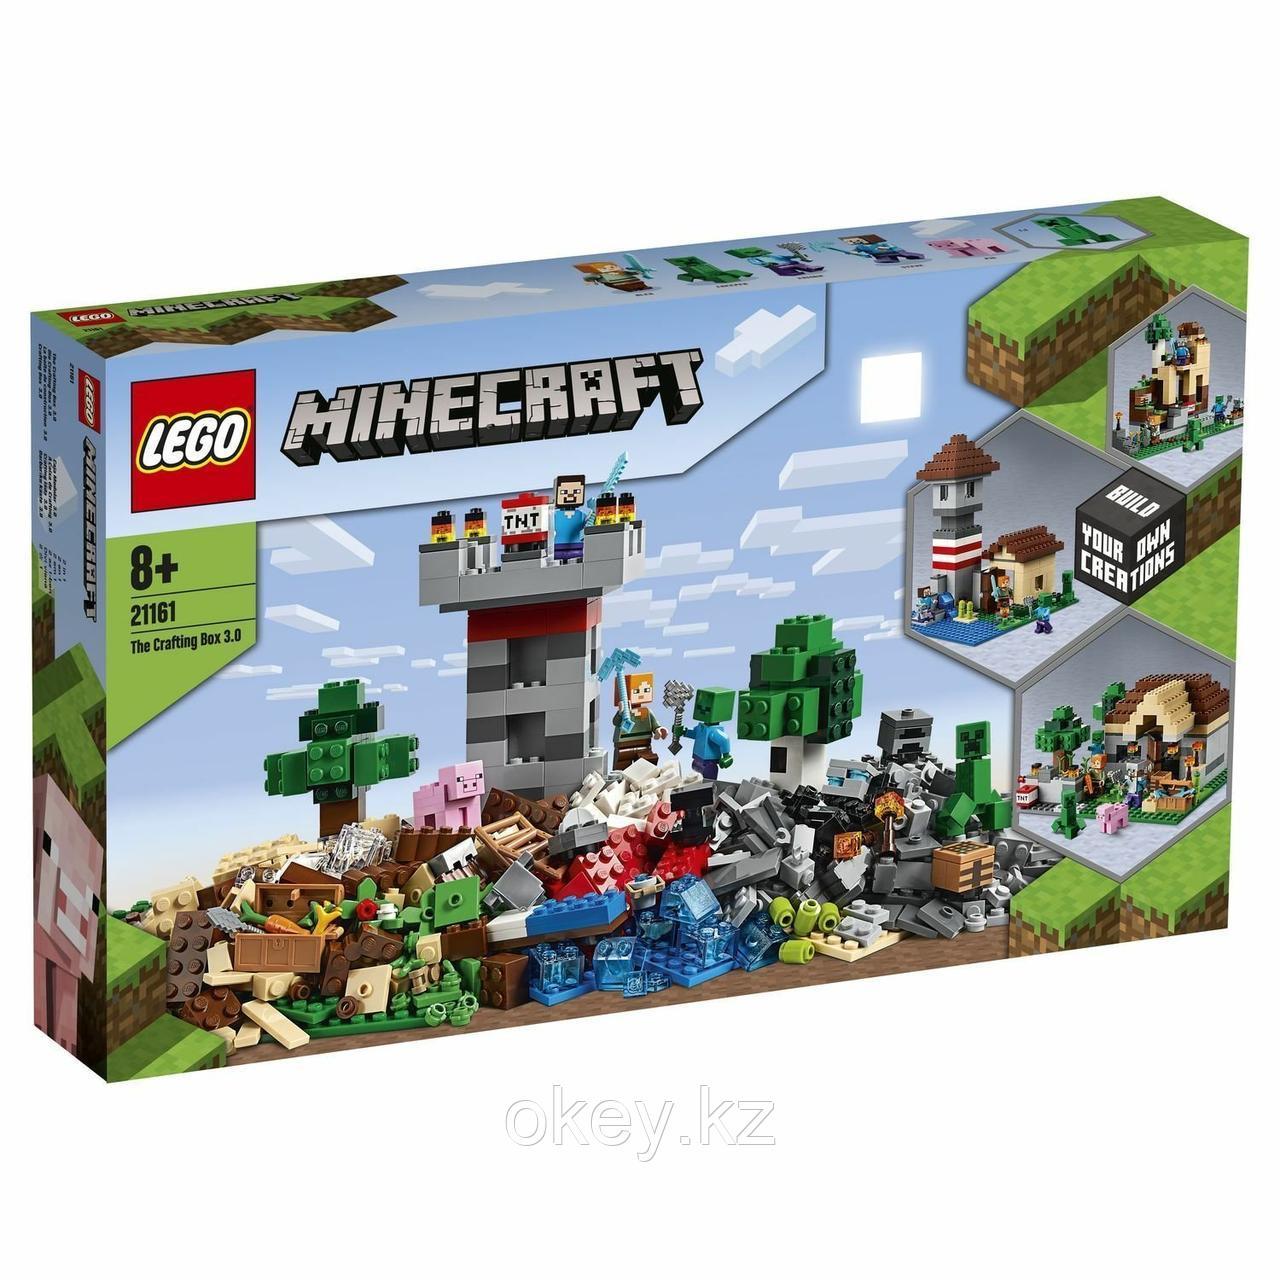 LEGO Minecraft: Набор для творчества 3.0 21161